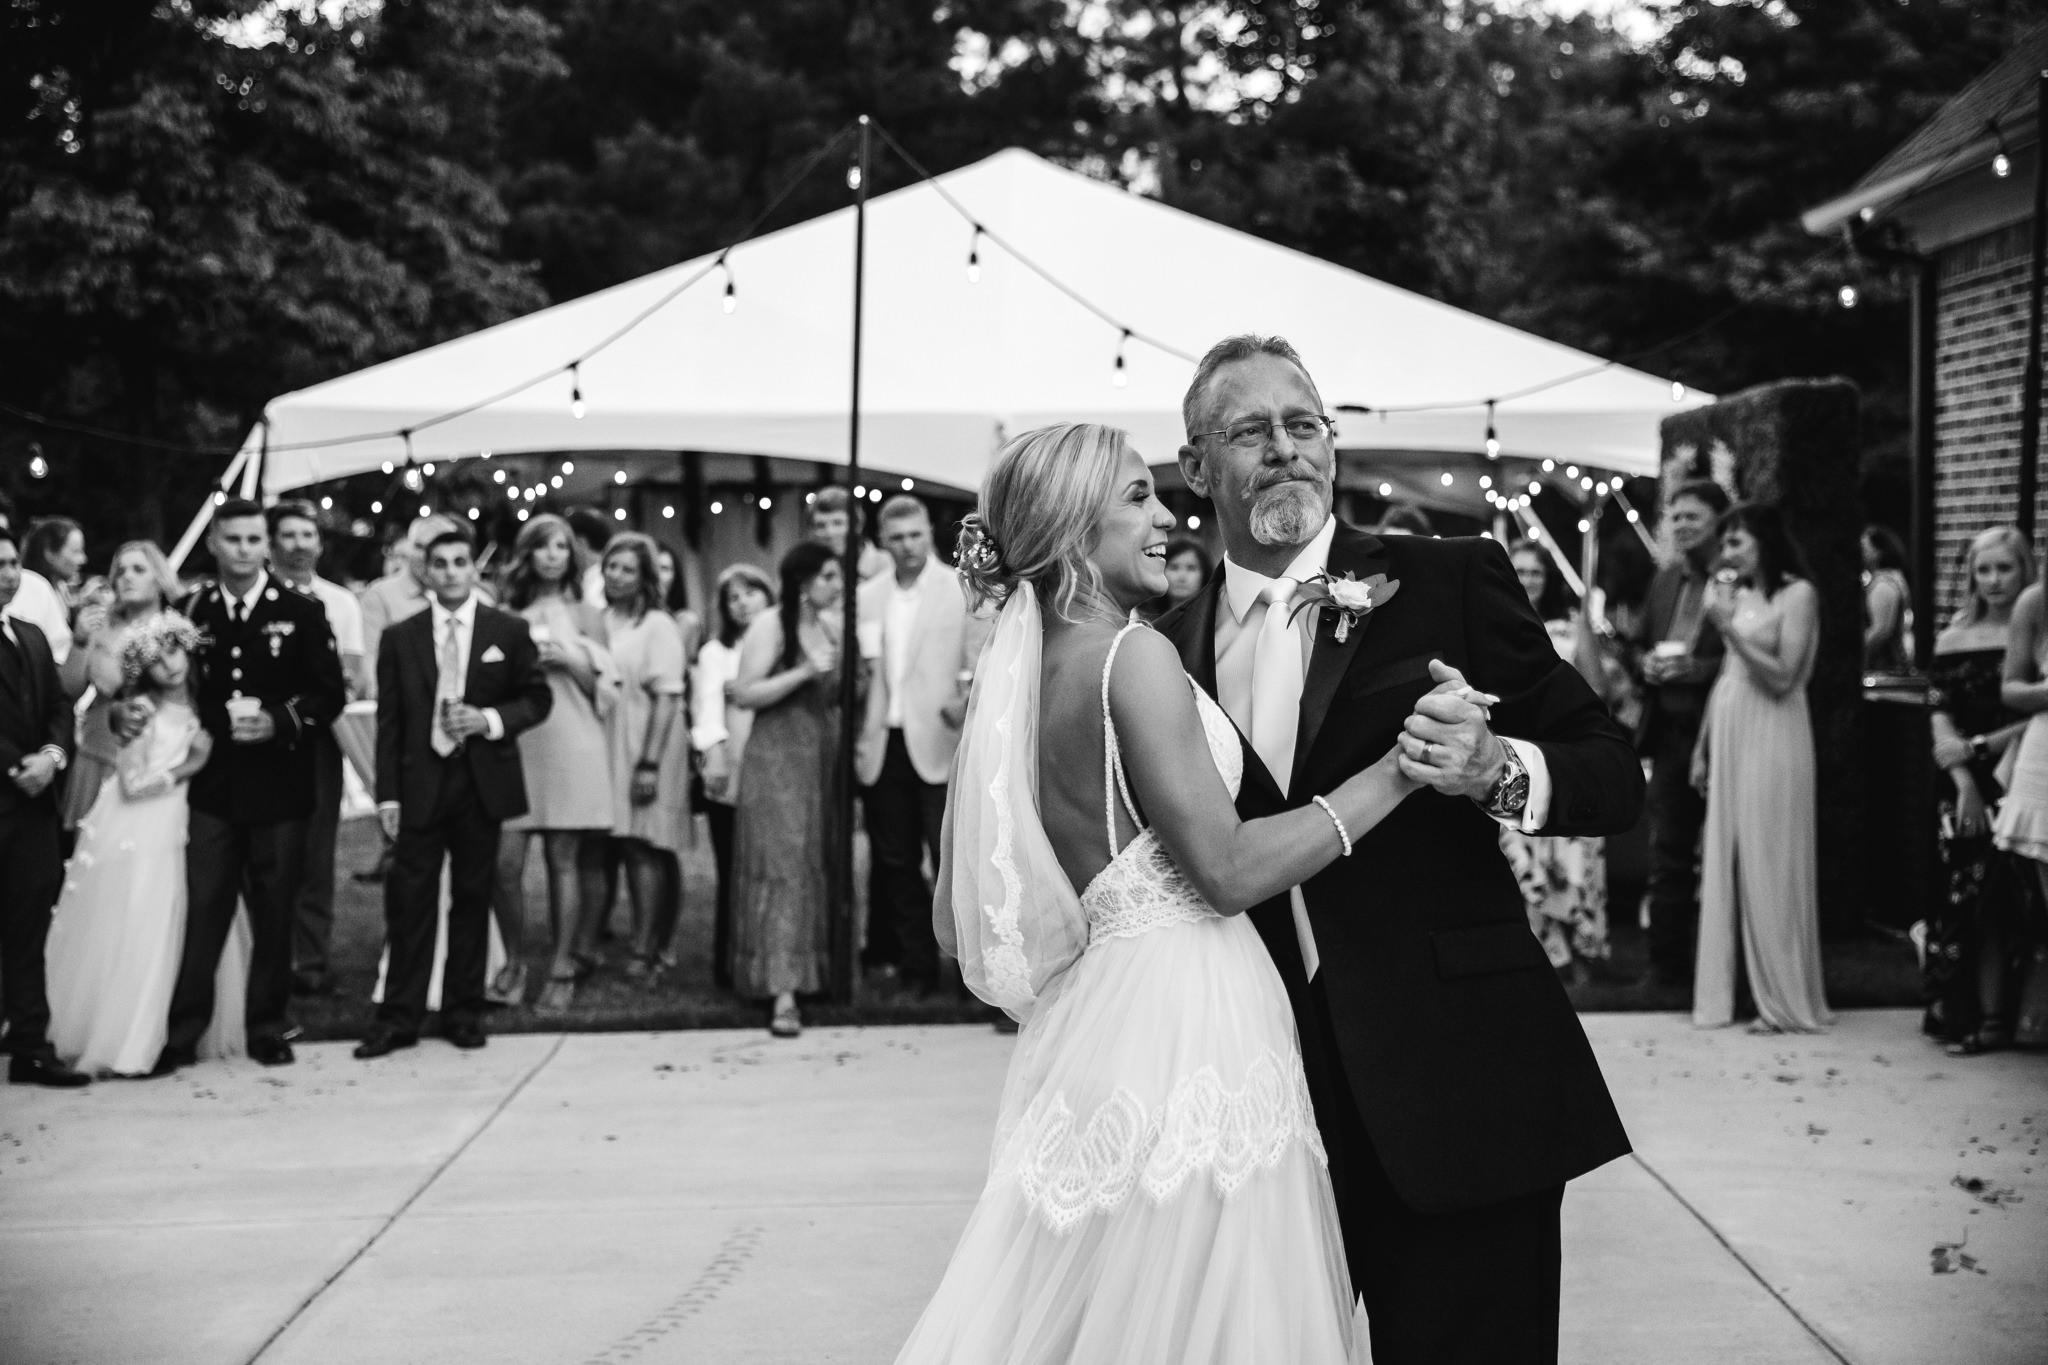 backyard-wedding-thewarmtharoundyou-lexy-branson-27.jpg